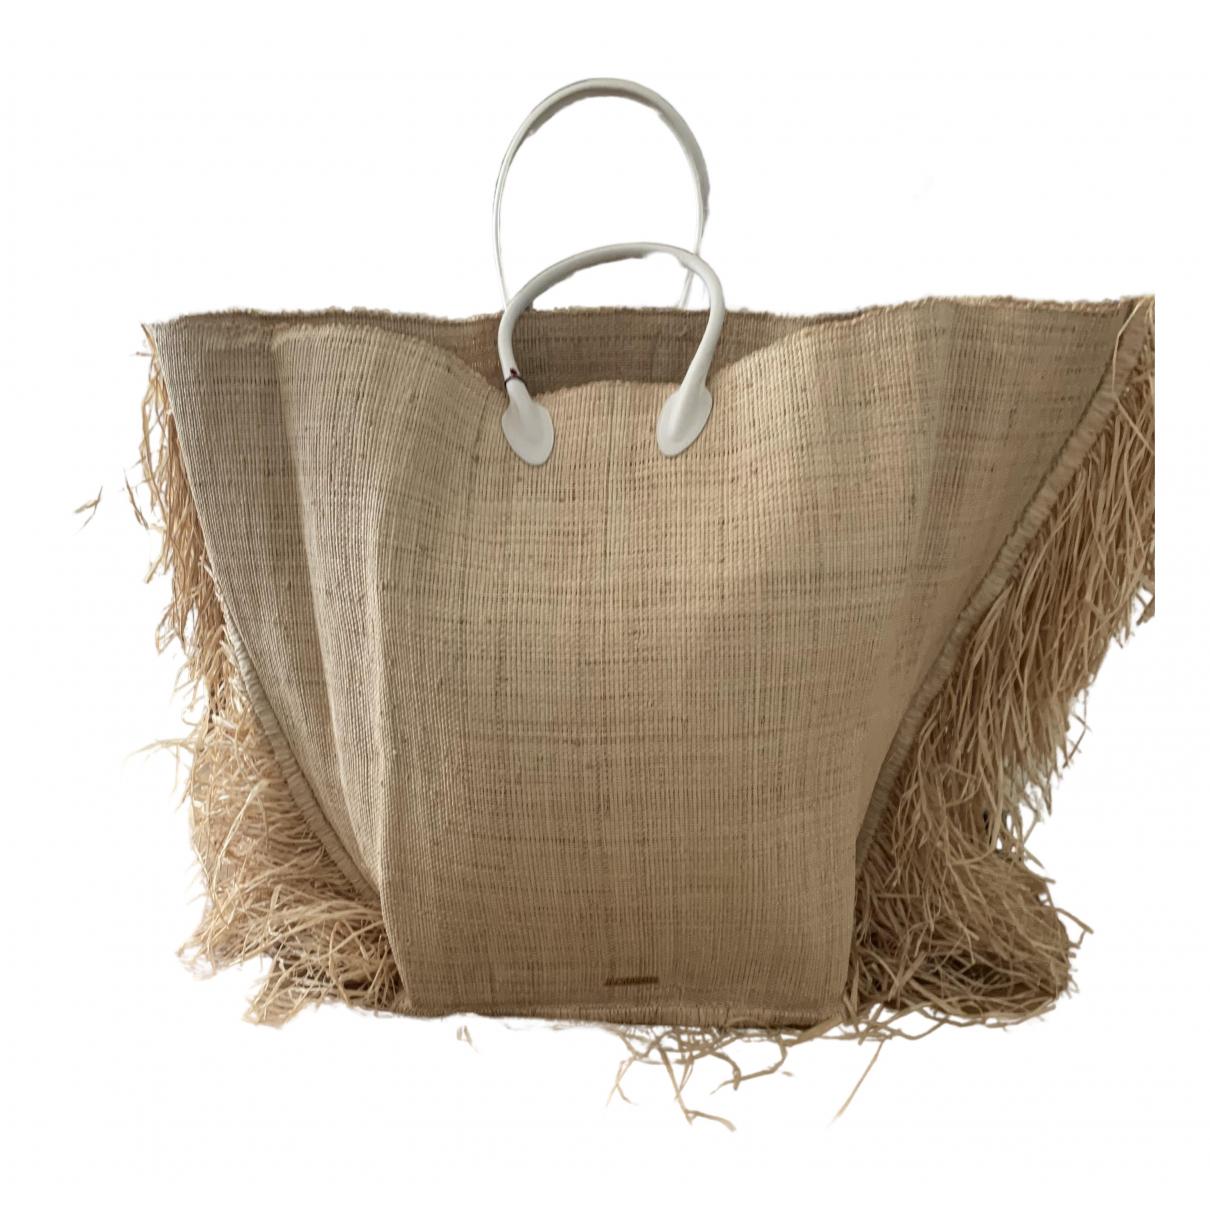 Jacquemus N Beige Wicker handbag for Women N